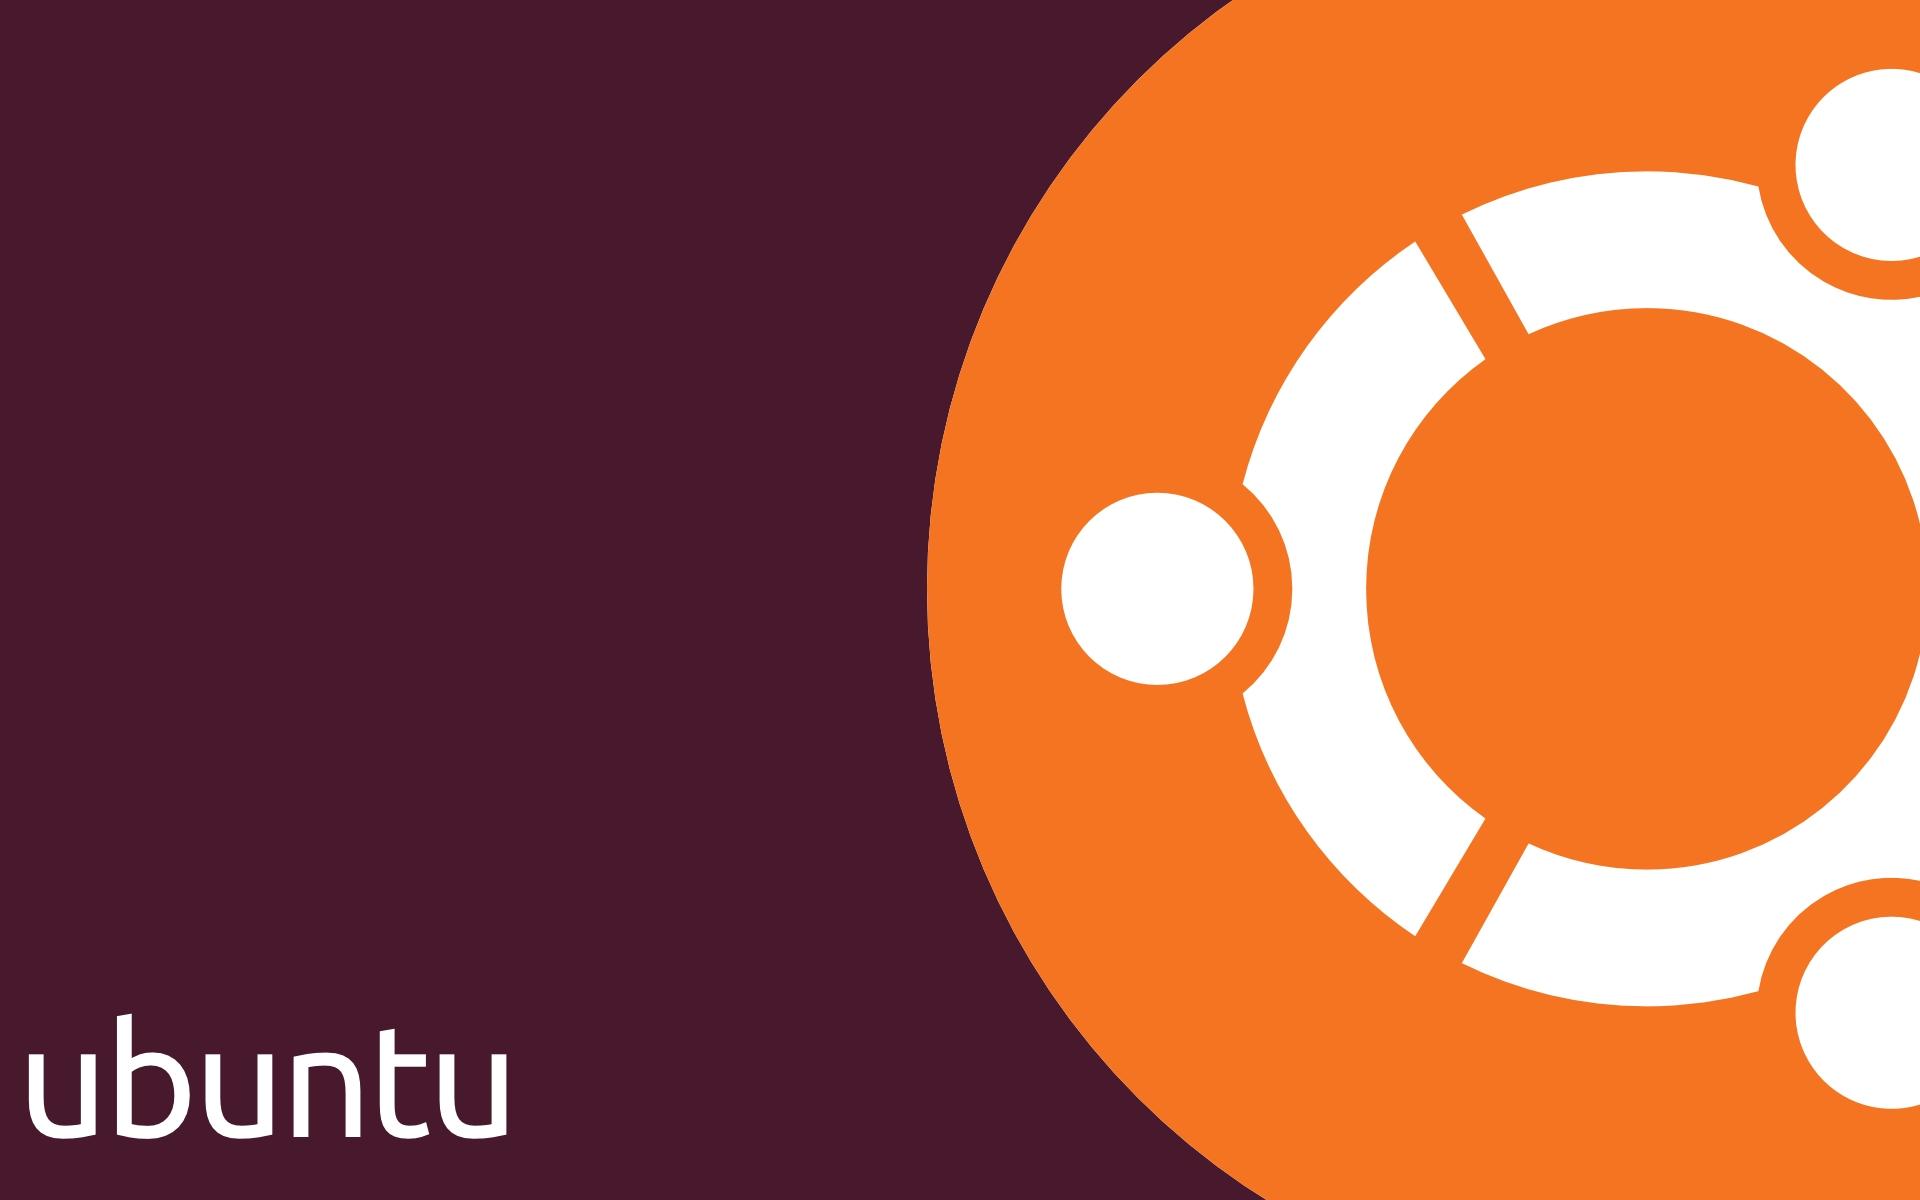 Ubuntu Logo wallpaper 232696 Ubuntu Logo